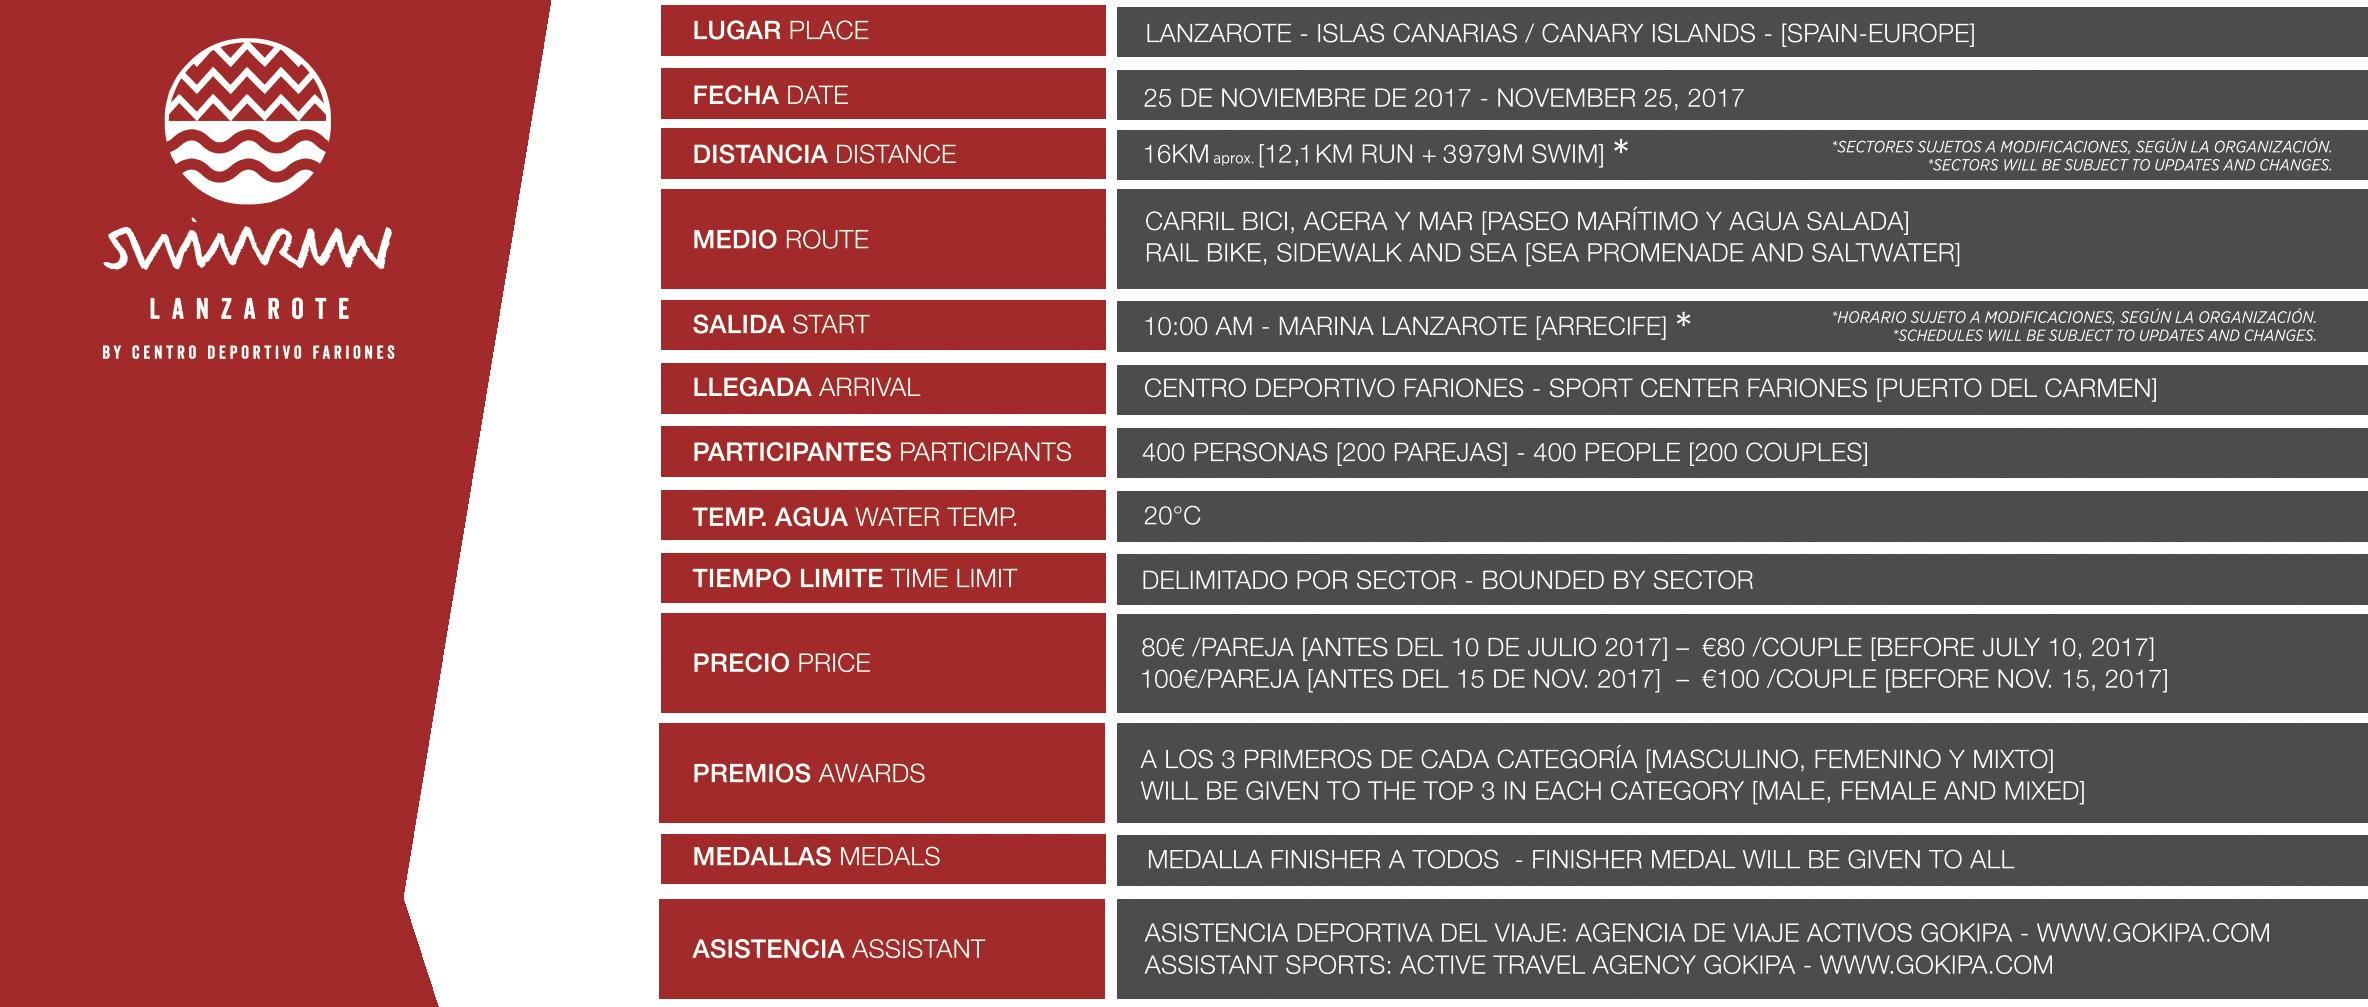 Ficha técnica de la prueba SwimRun Lanzarote - España